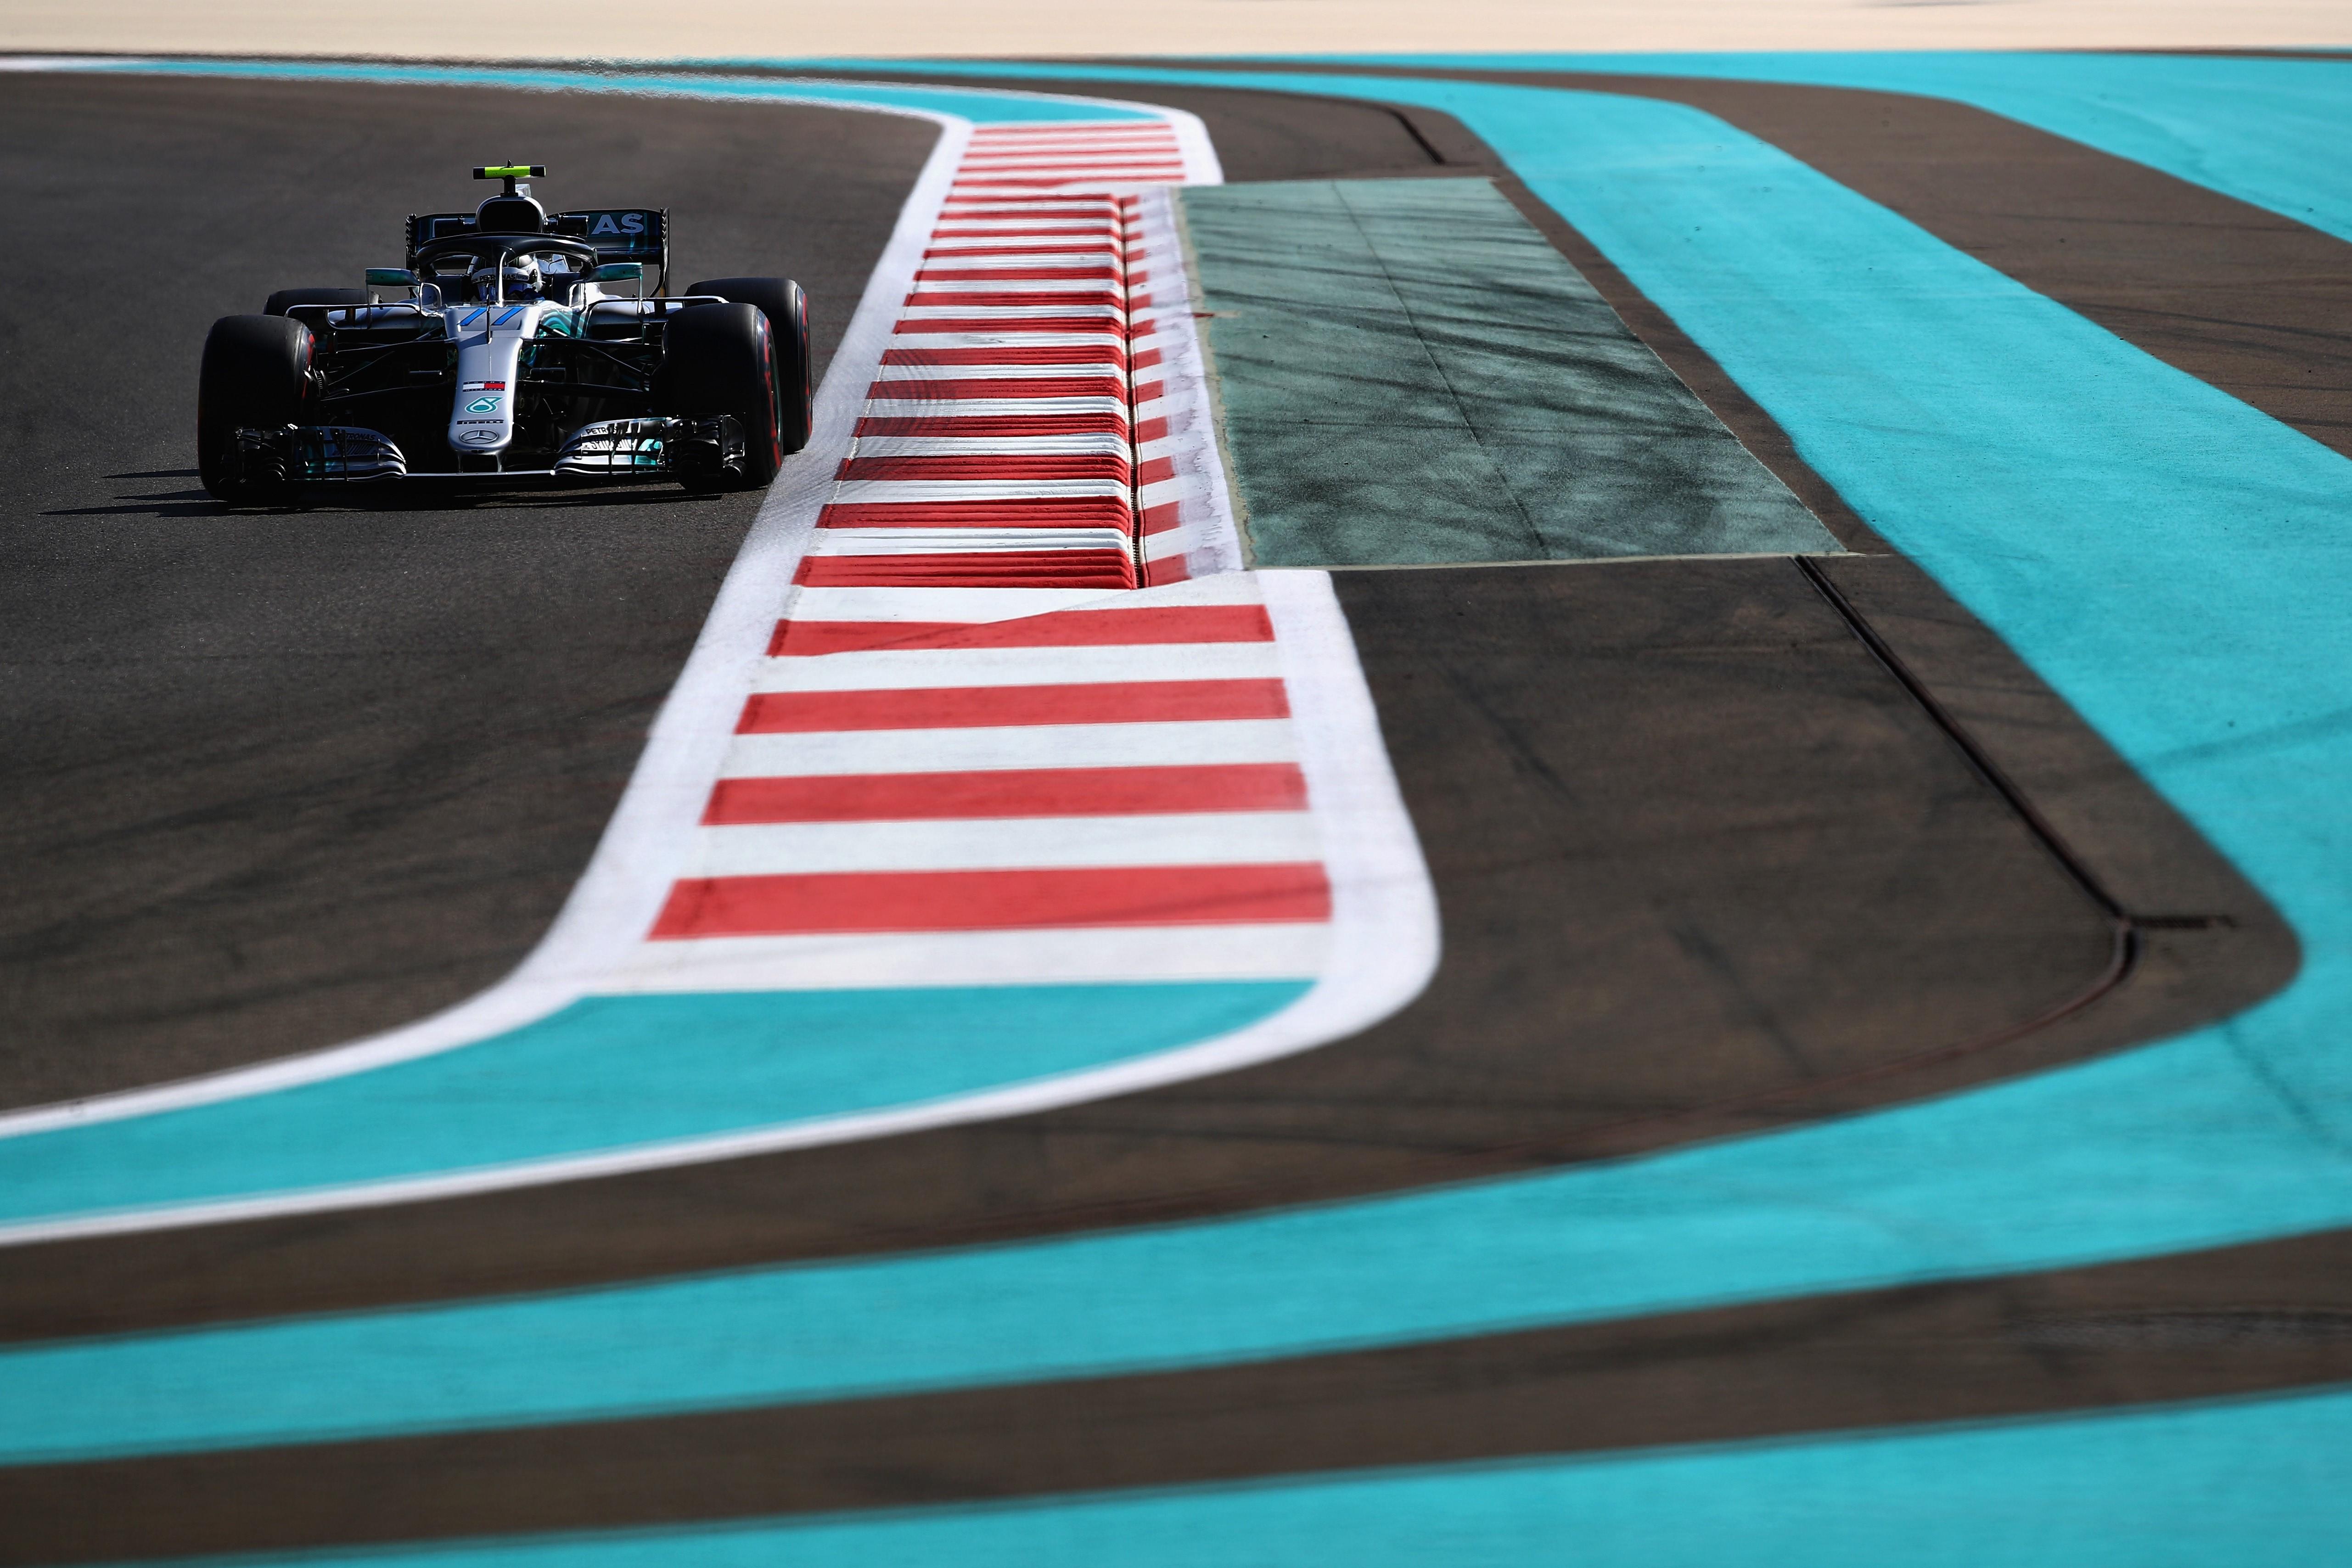 Valtteri Bottas (Mercedes) au Grand Prix d'Abou Dabi 2018